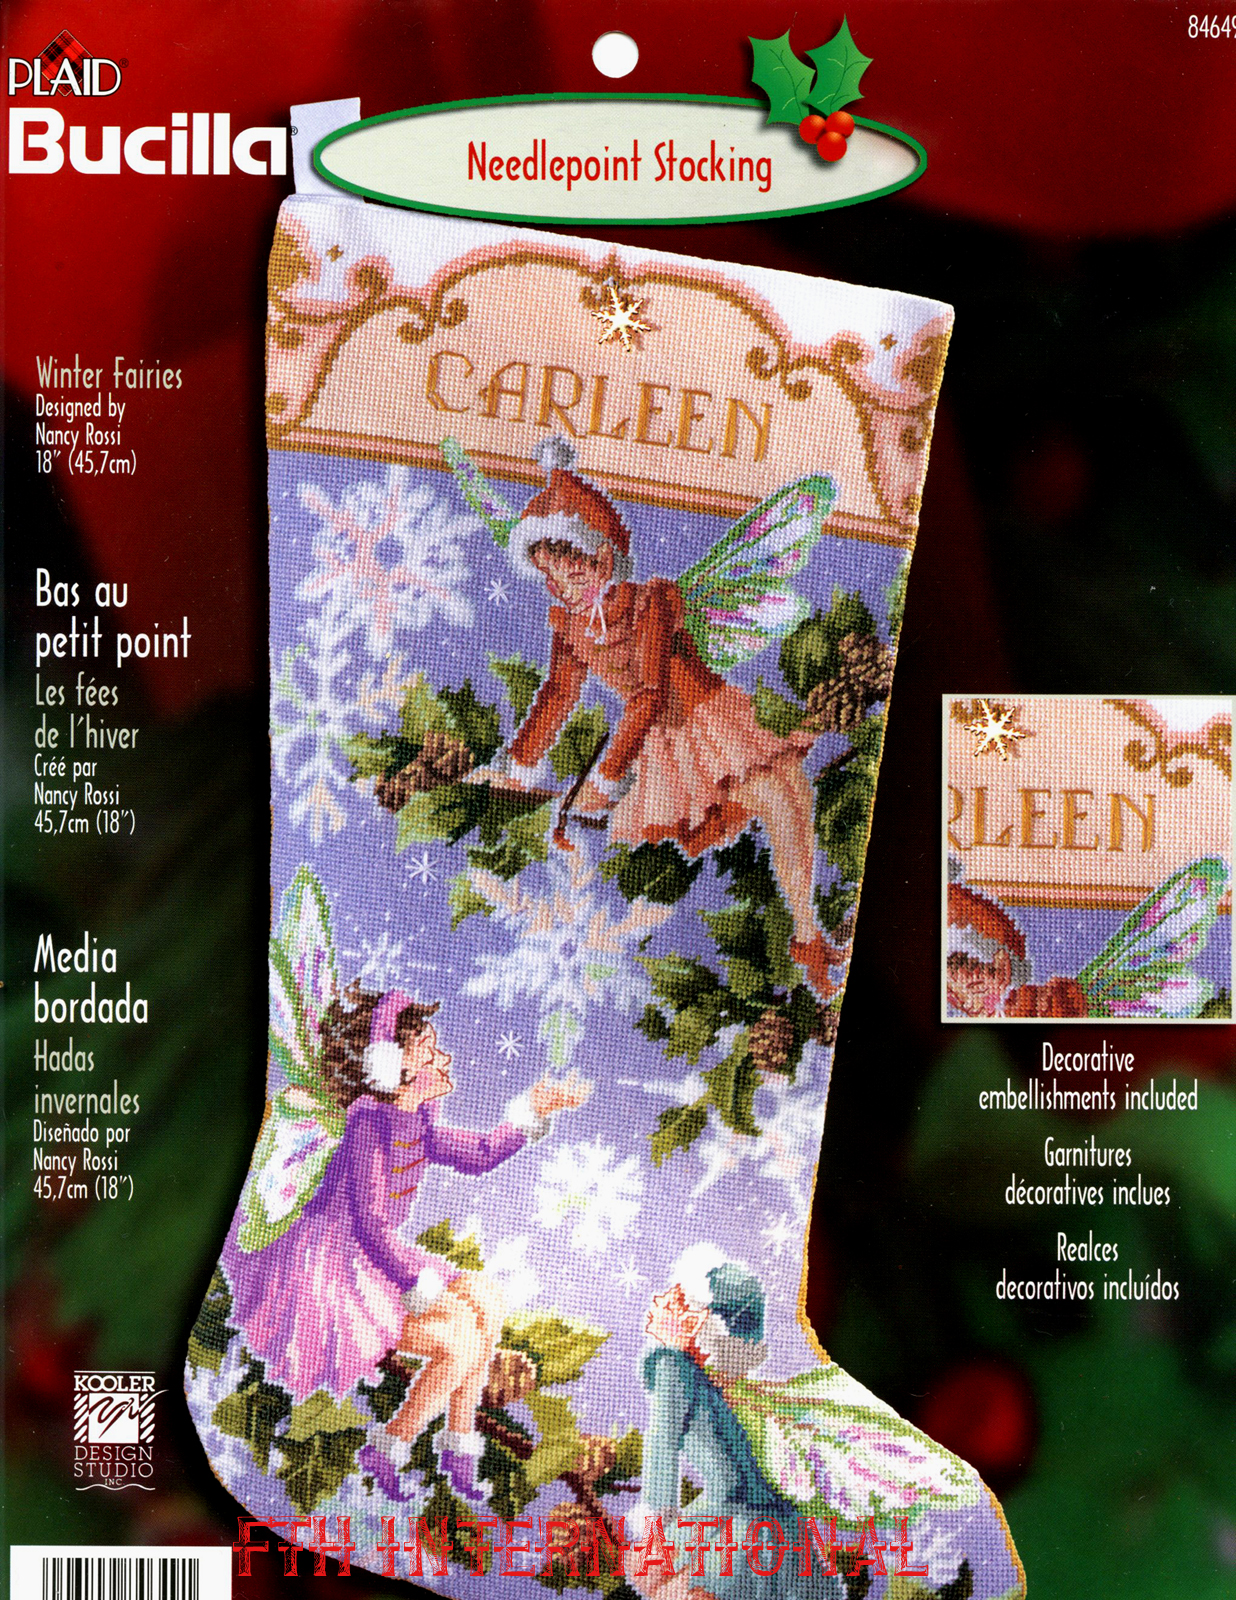 Needlepoint Christmas Stocking Kits.Winter Fairies 18 Bucilla Needlepoint Christmas Stocking Kit 84649